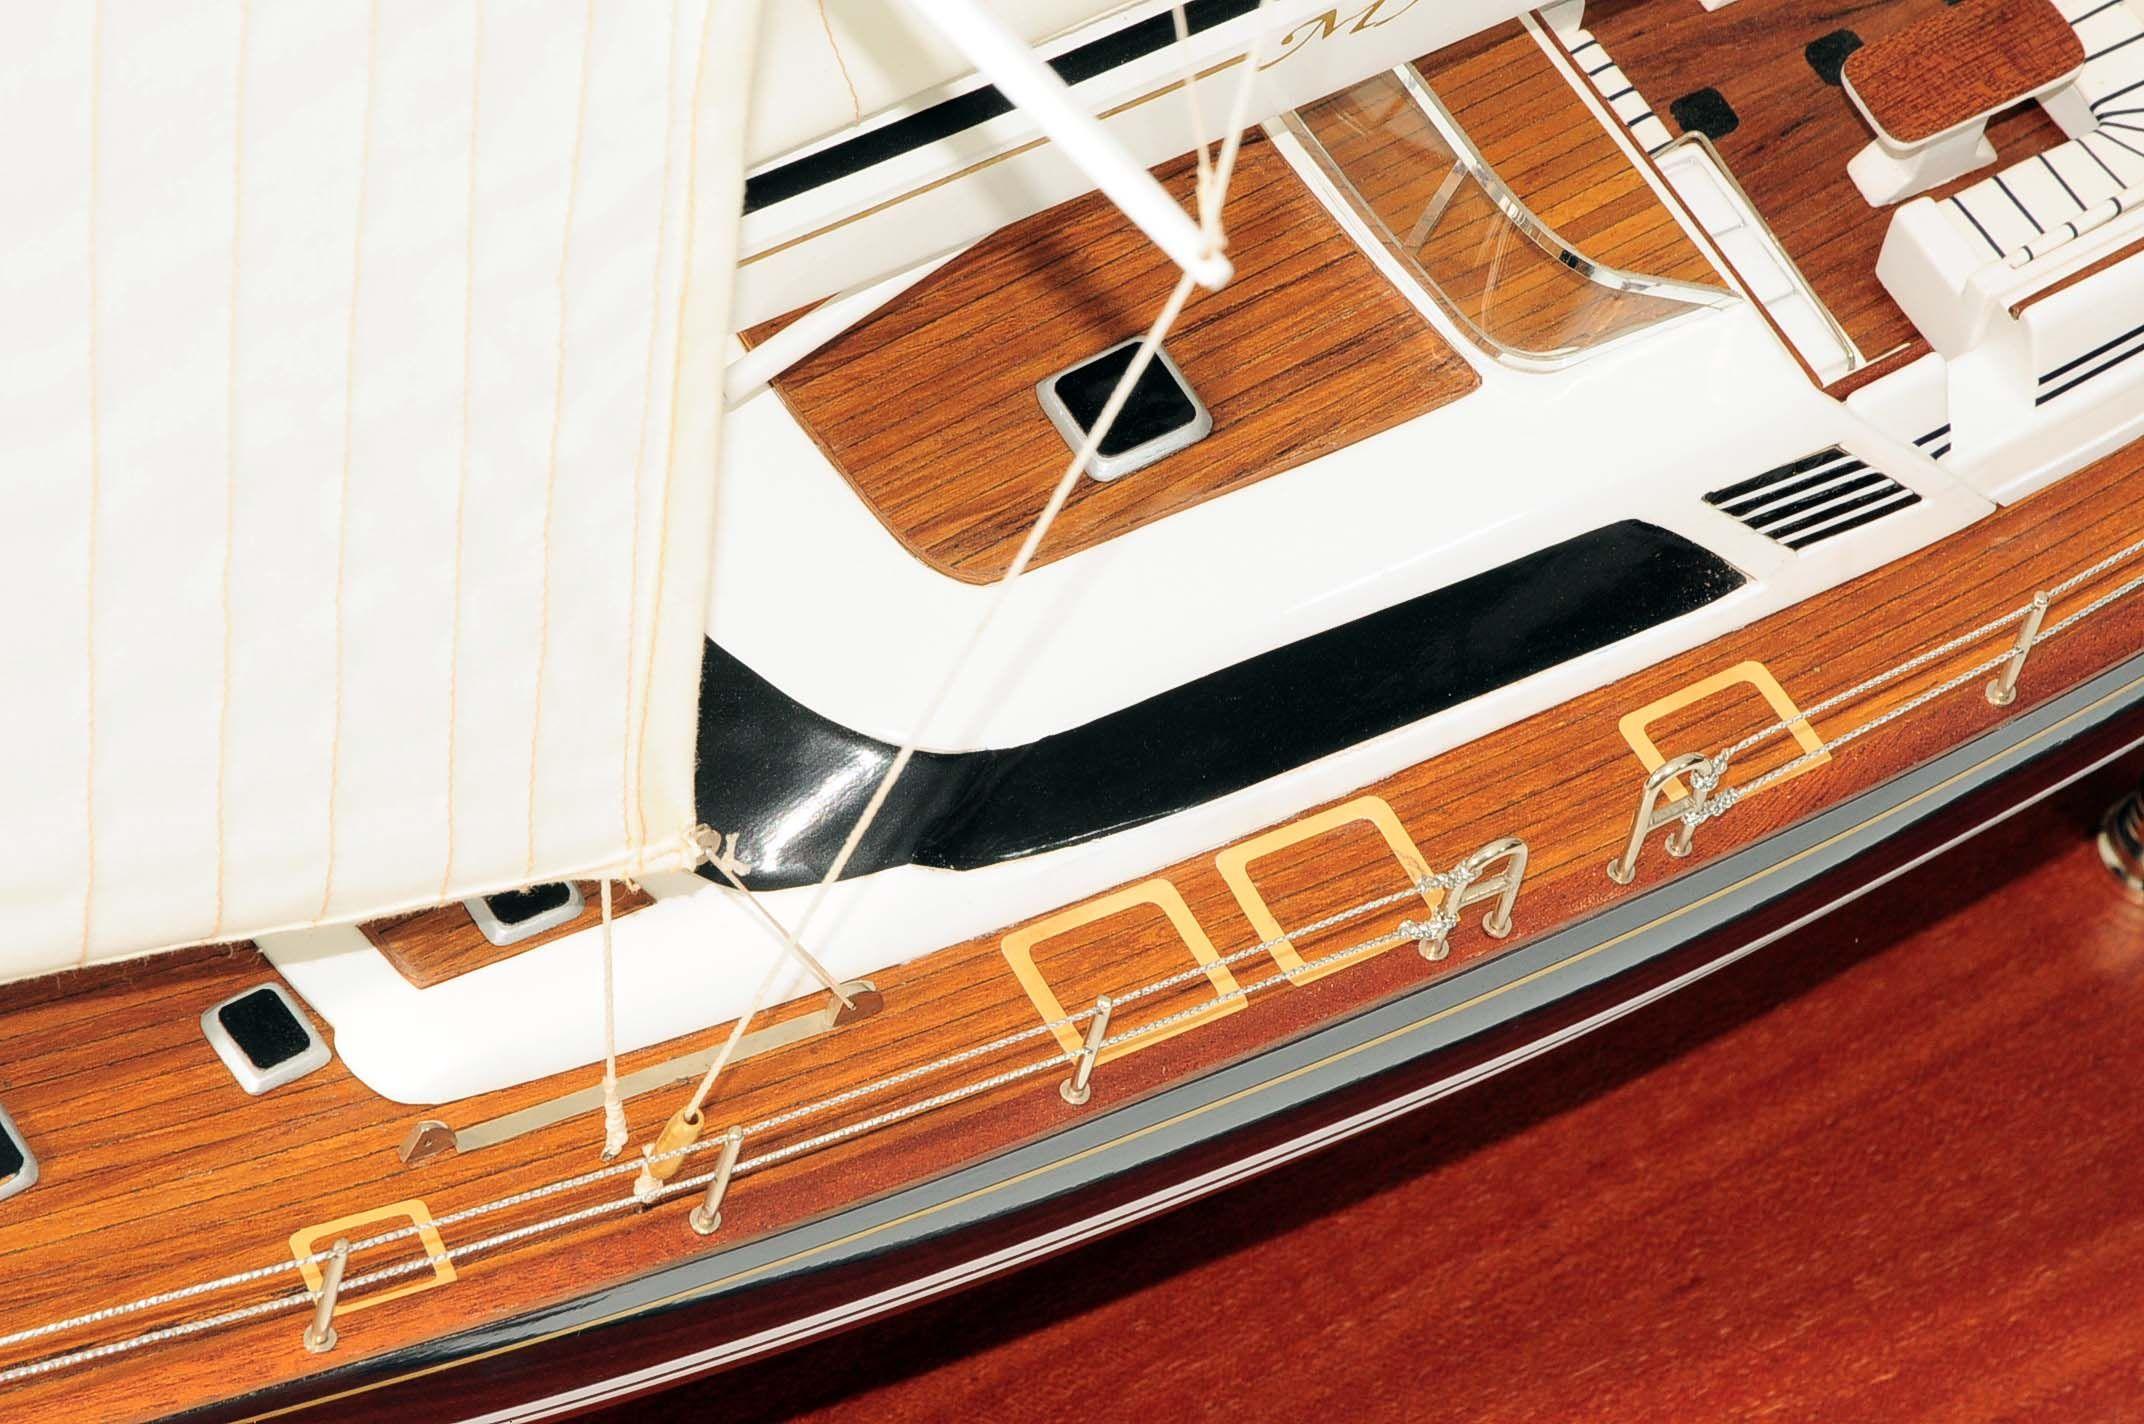 709-6077-Mystery-Model-Yacht